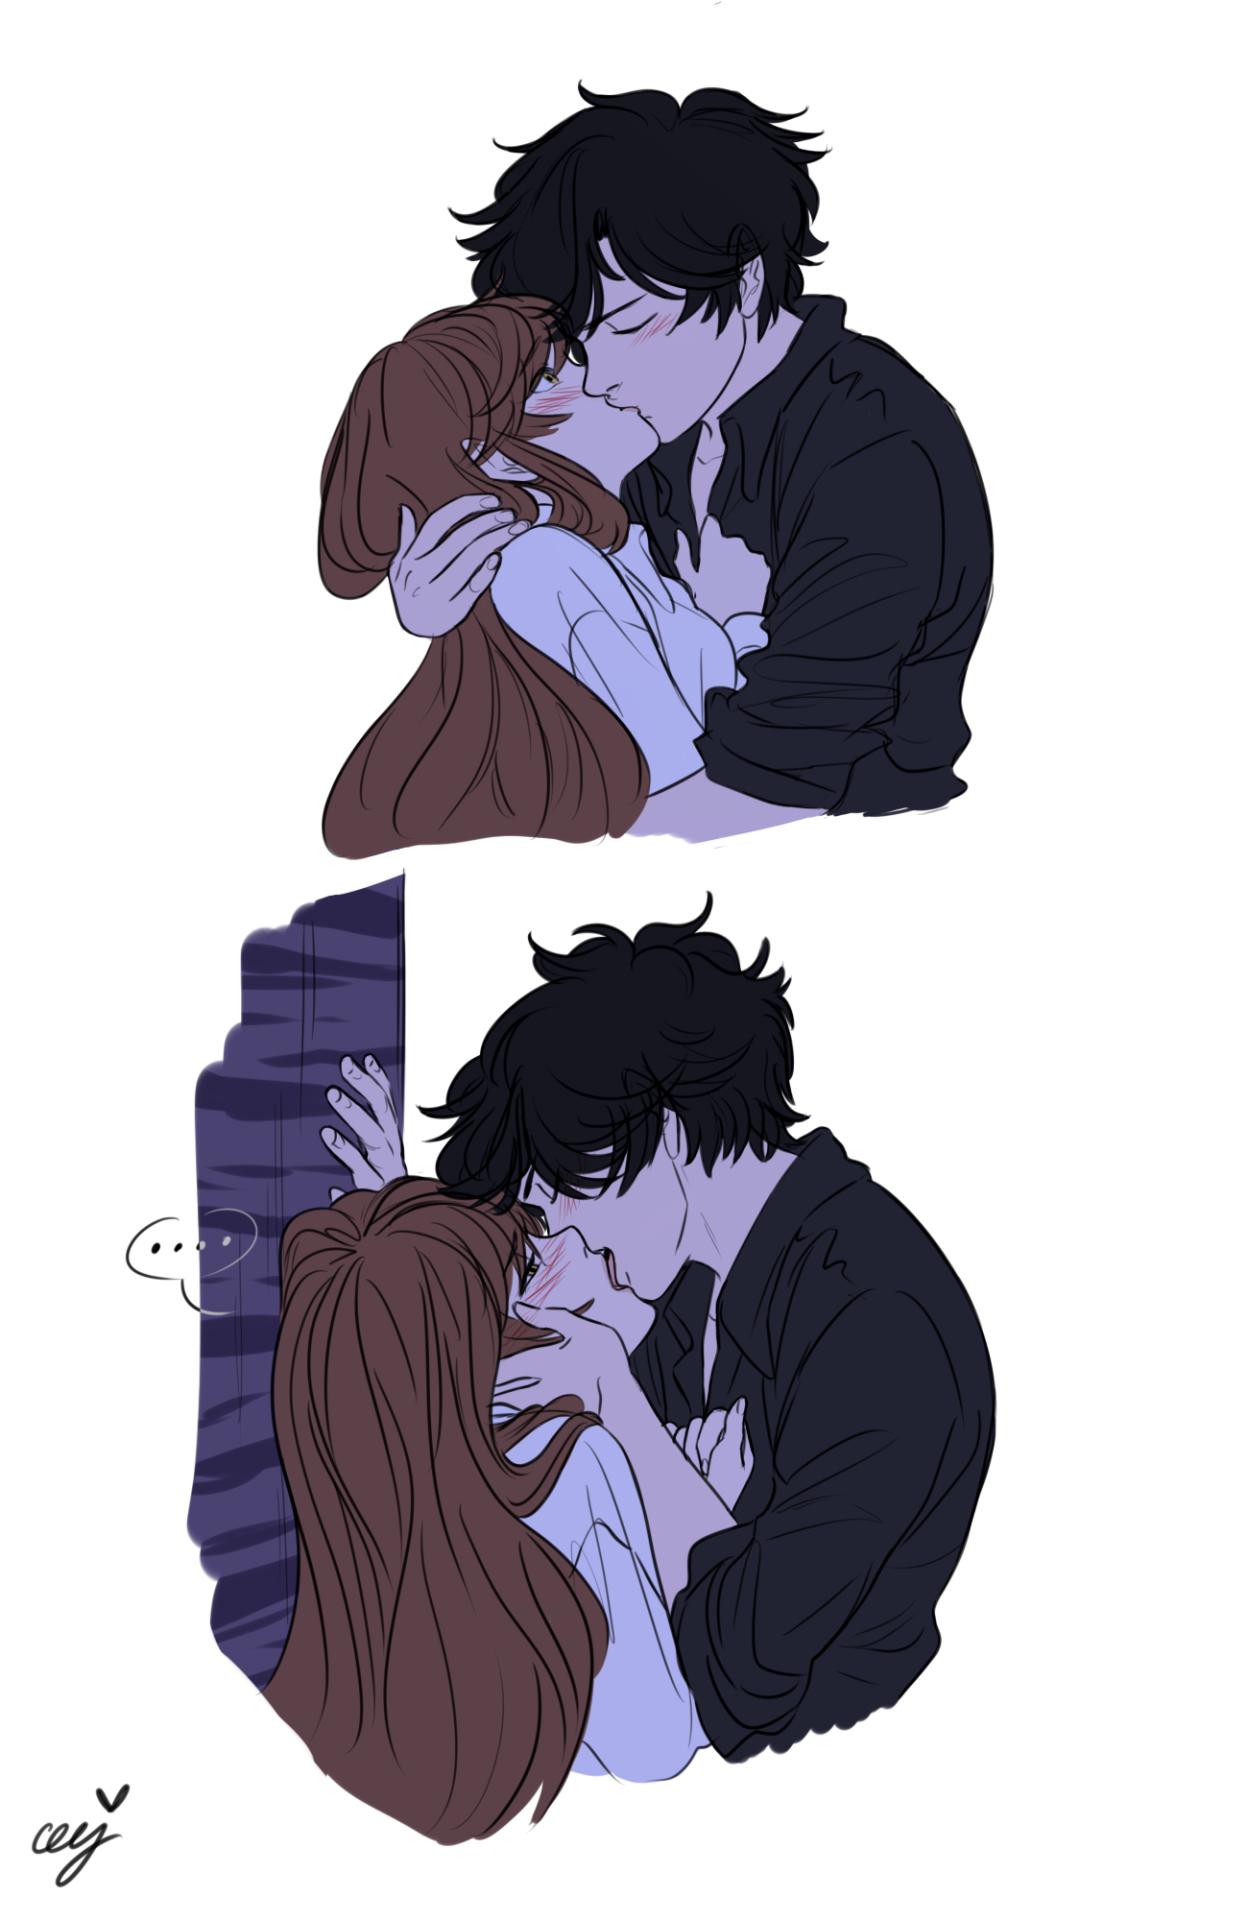 Ceejles I M Not Done With The Dizziness Jeez Jumin Anime Kiss Anime Couple Kiss Mystic Messenger